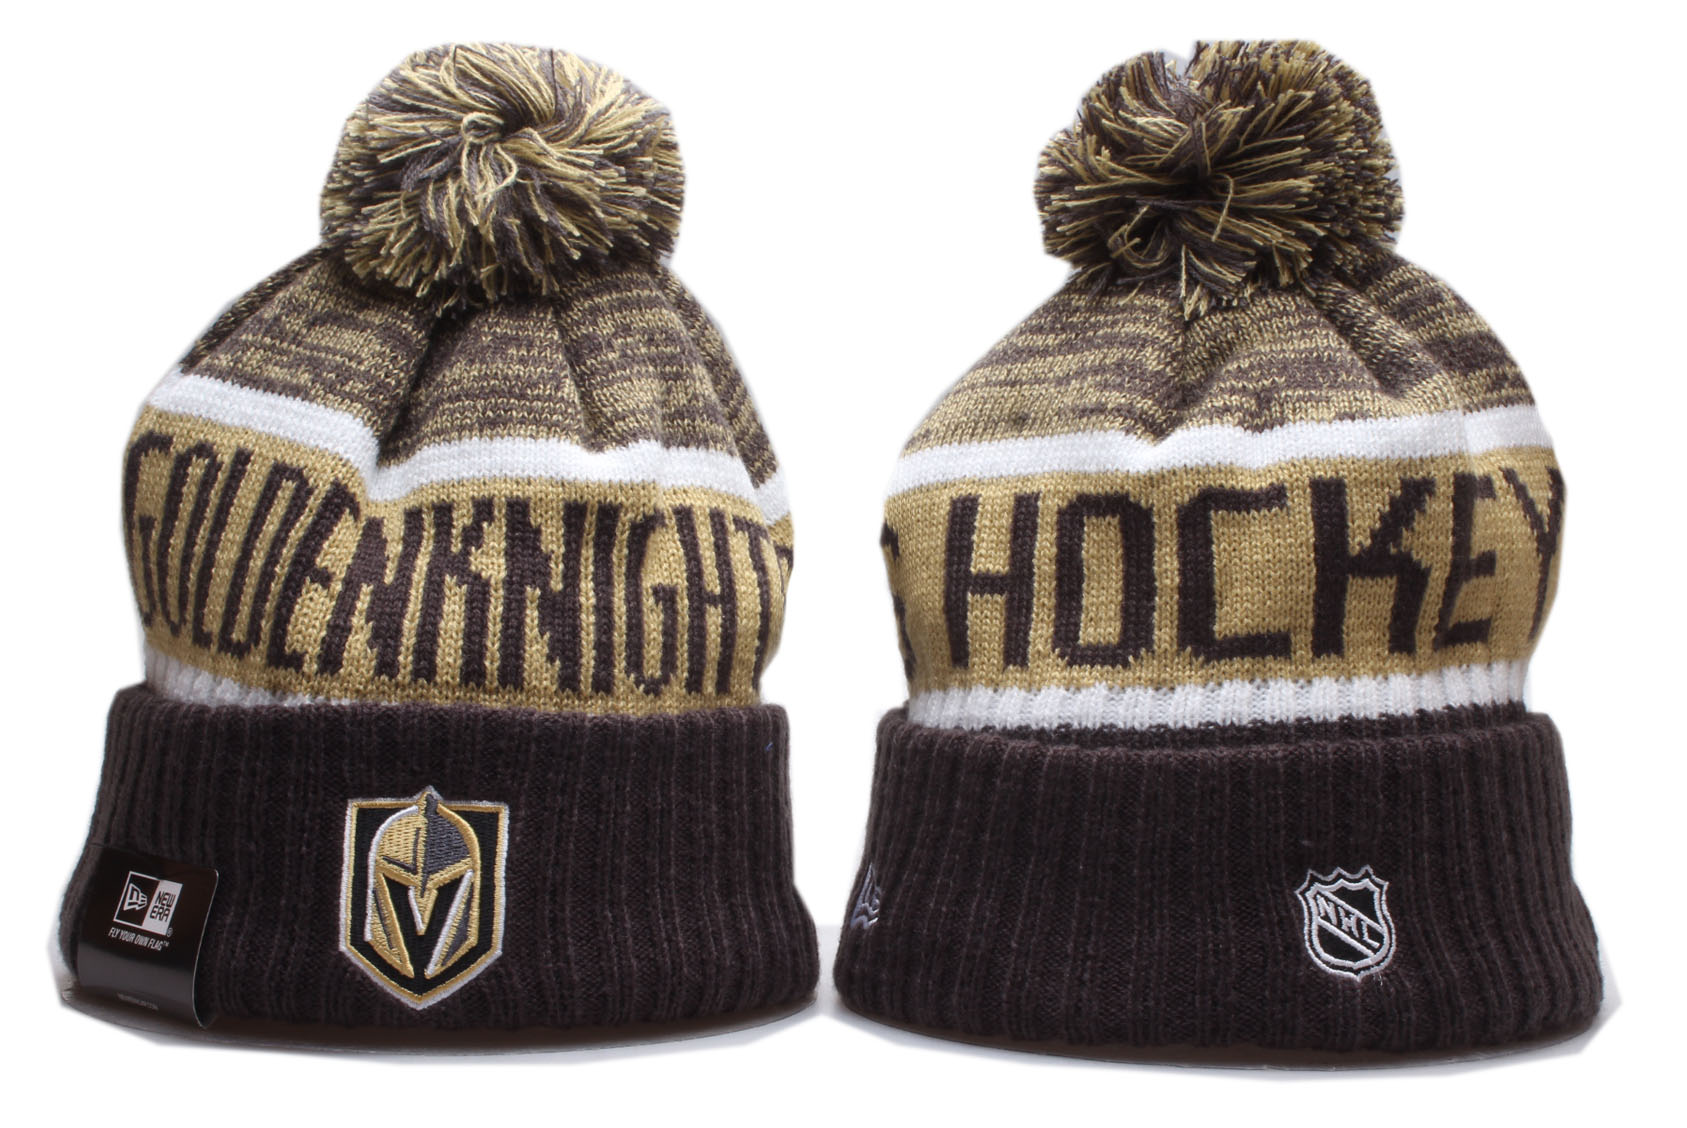 Vegas Golden Knights Team Logo Camo Cuffed Pom Knit Hat YP